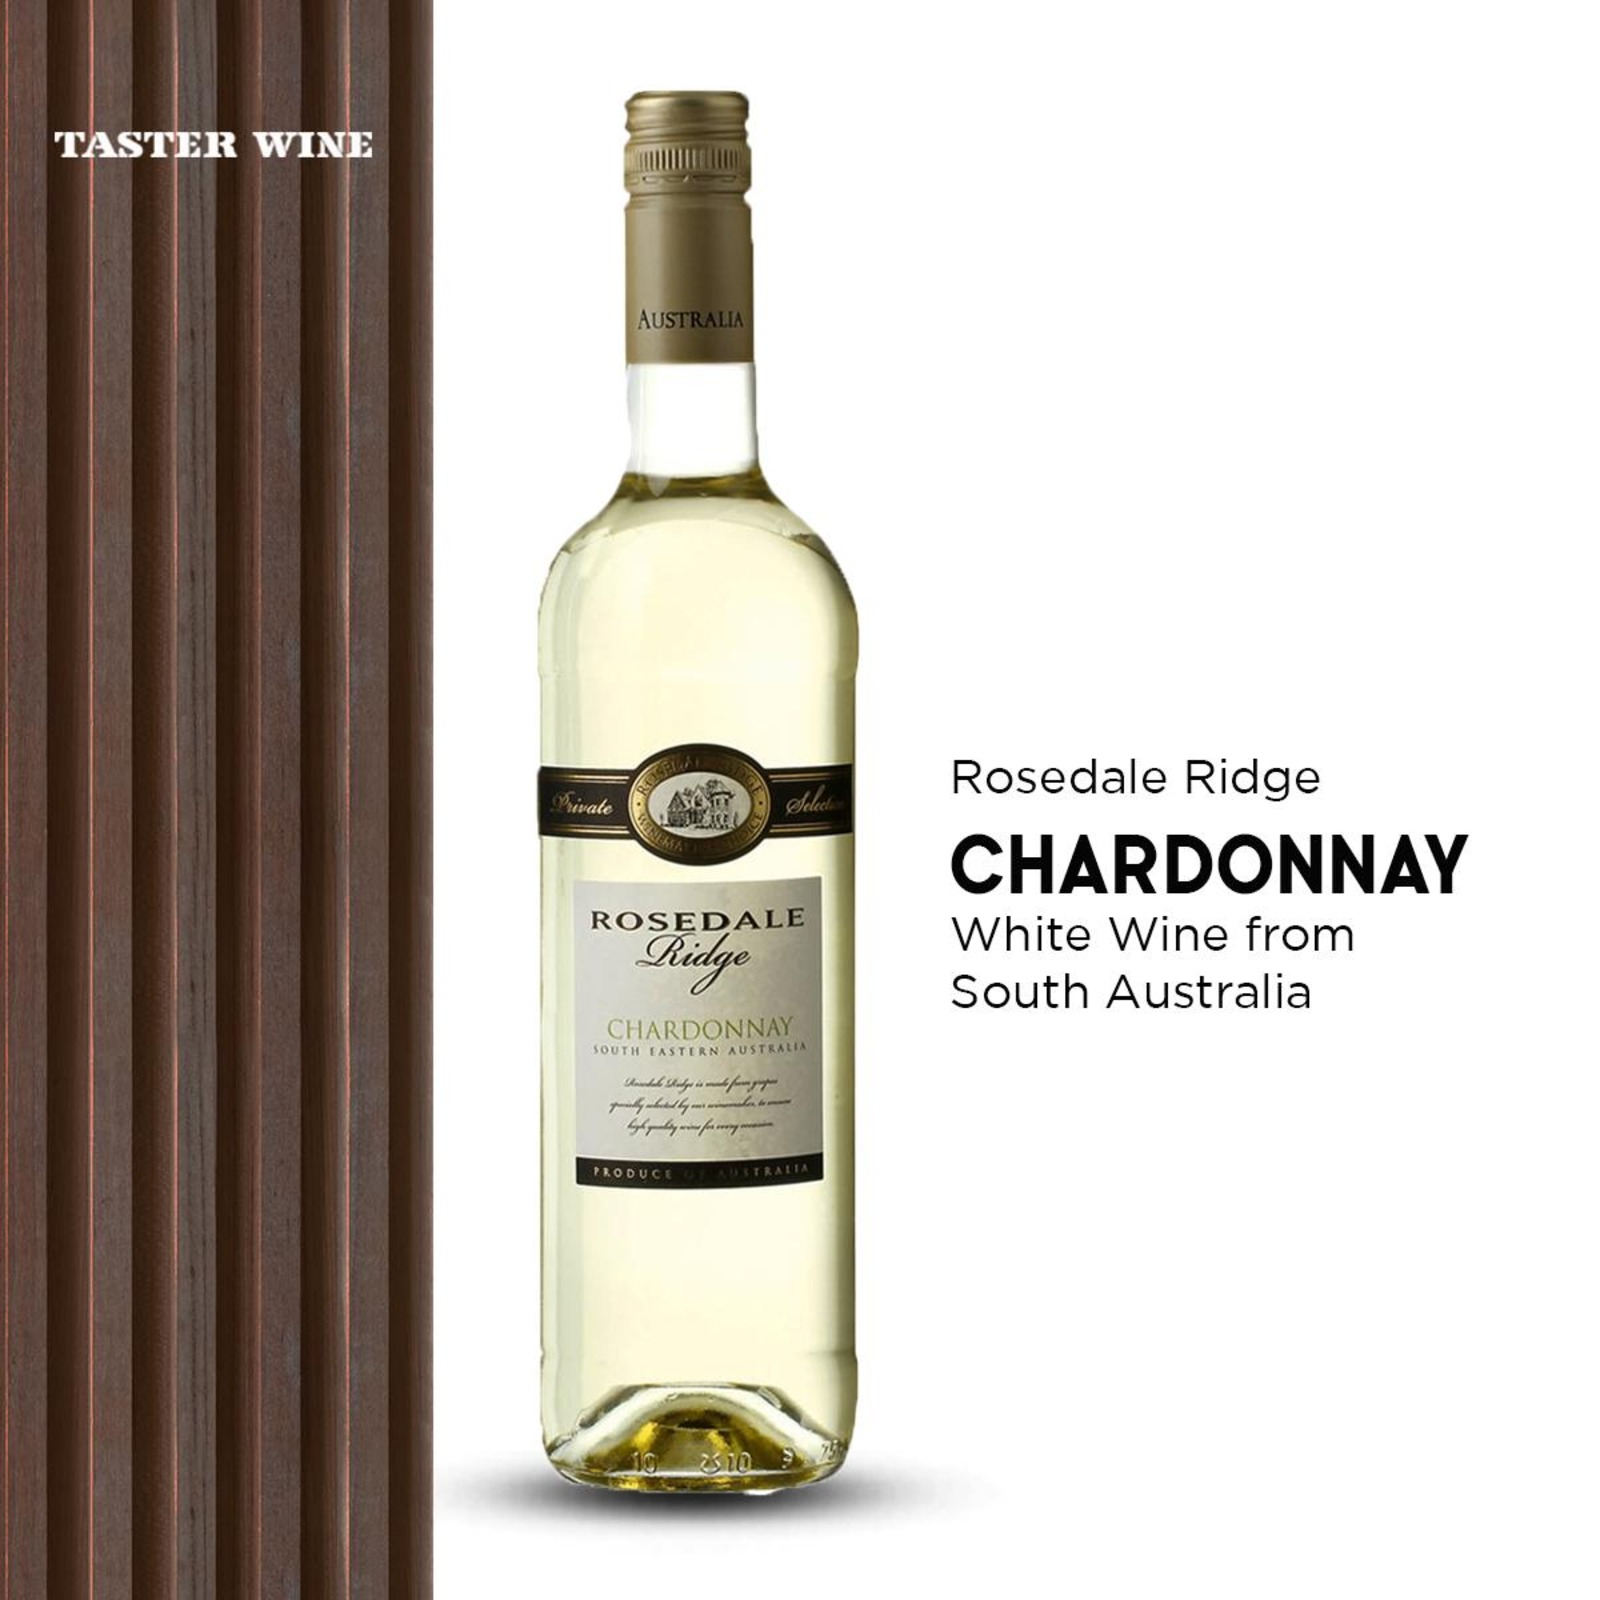 Rosedale Ridge Chardonnay - White Wine